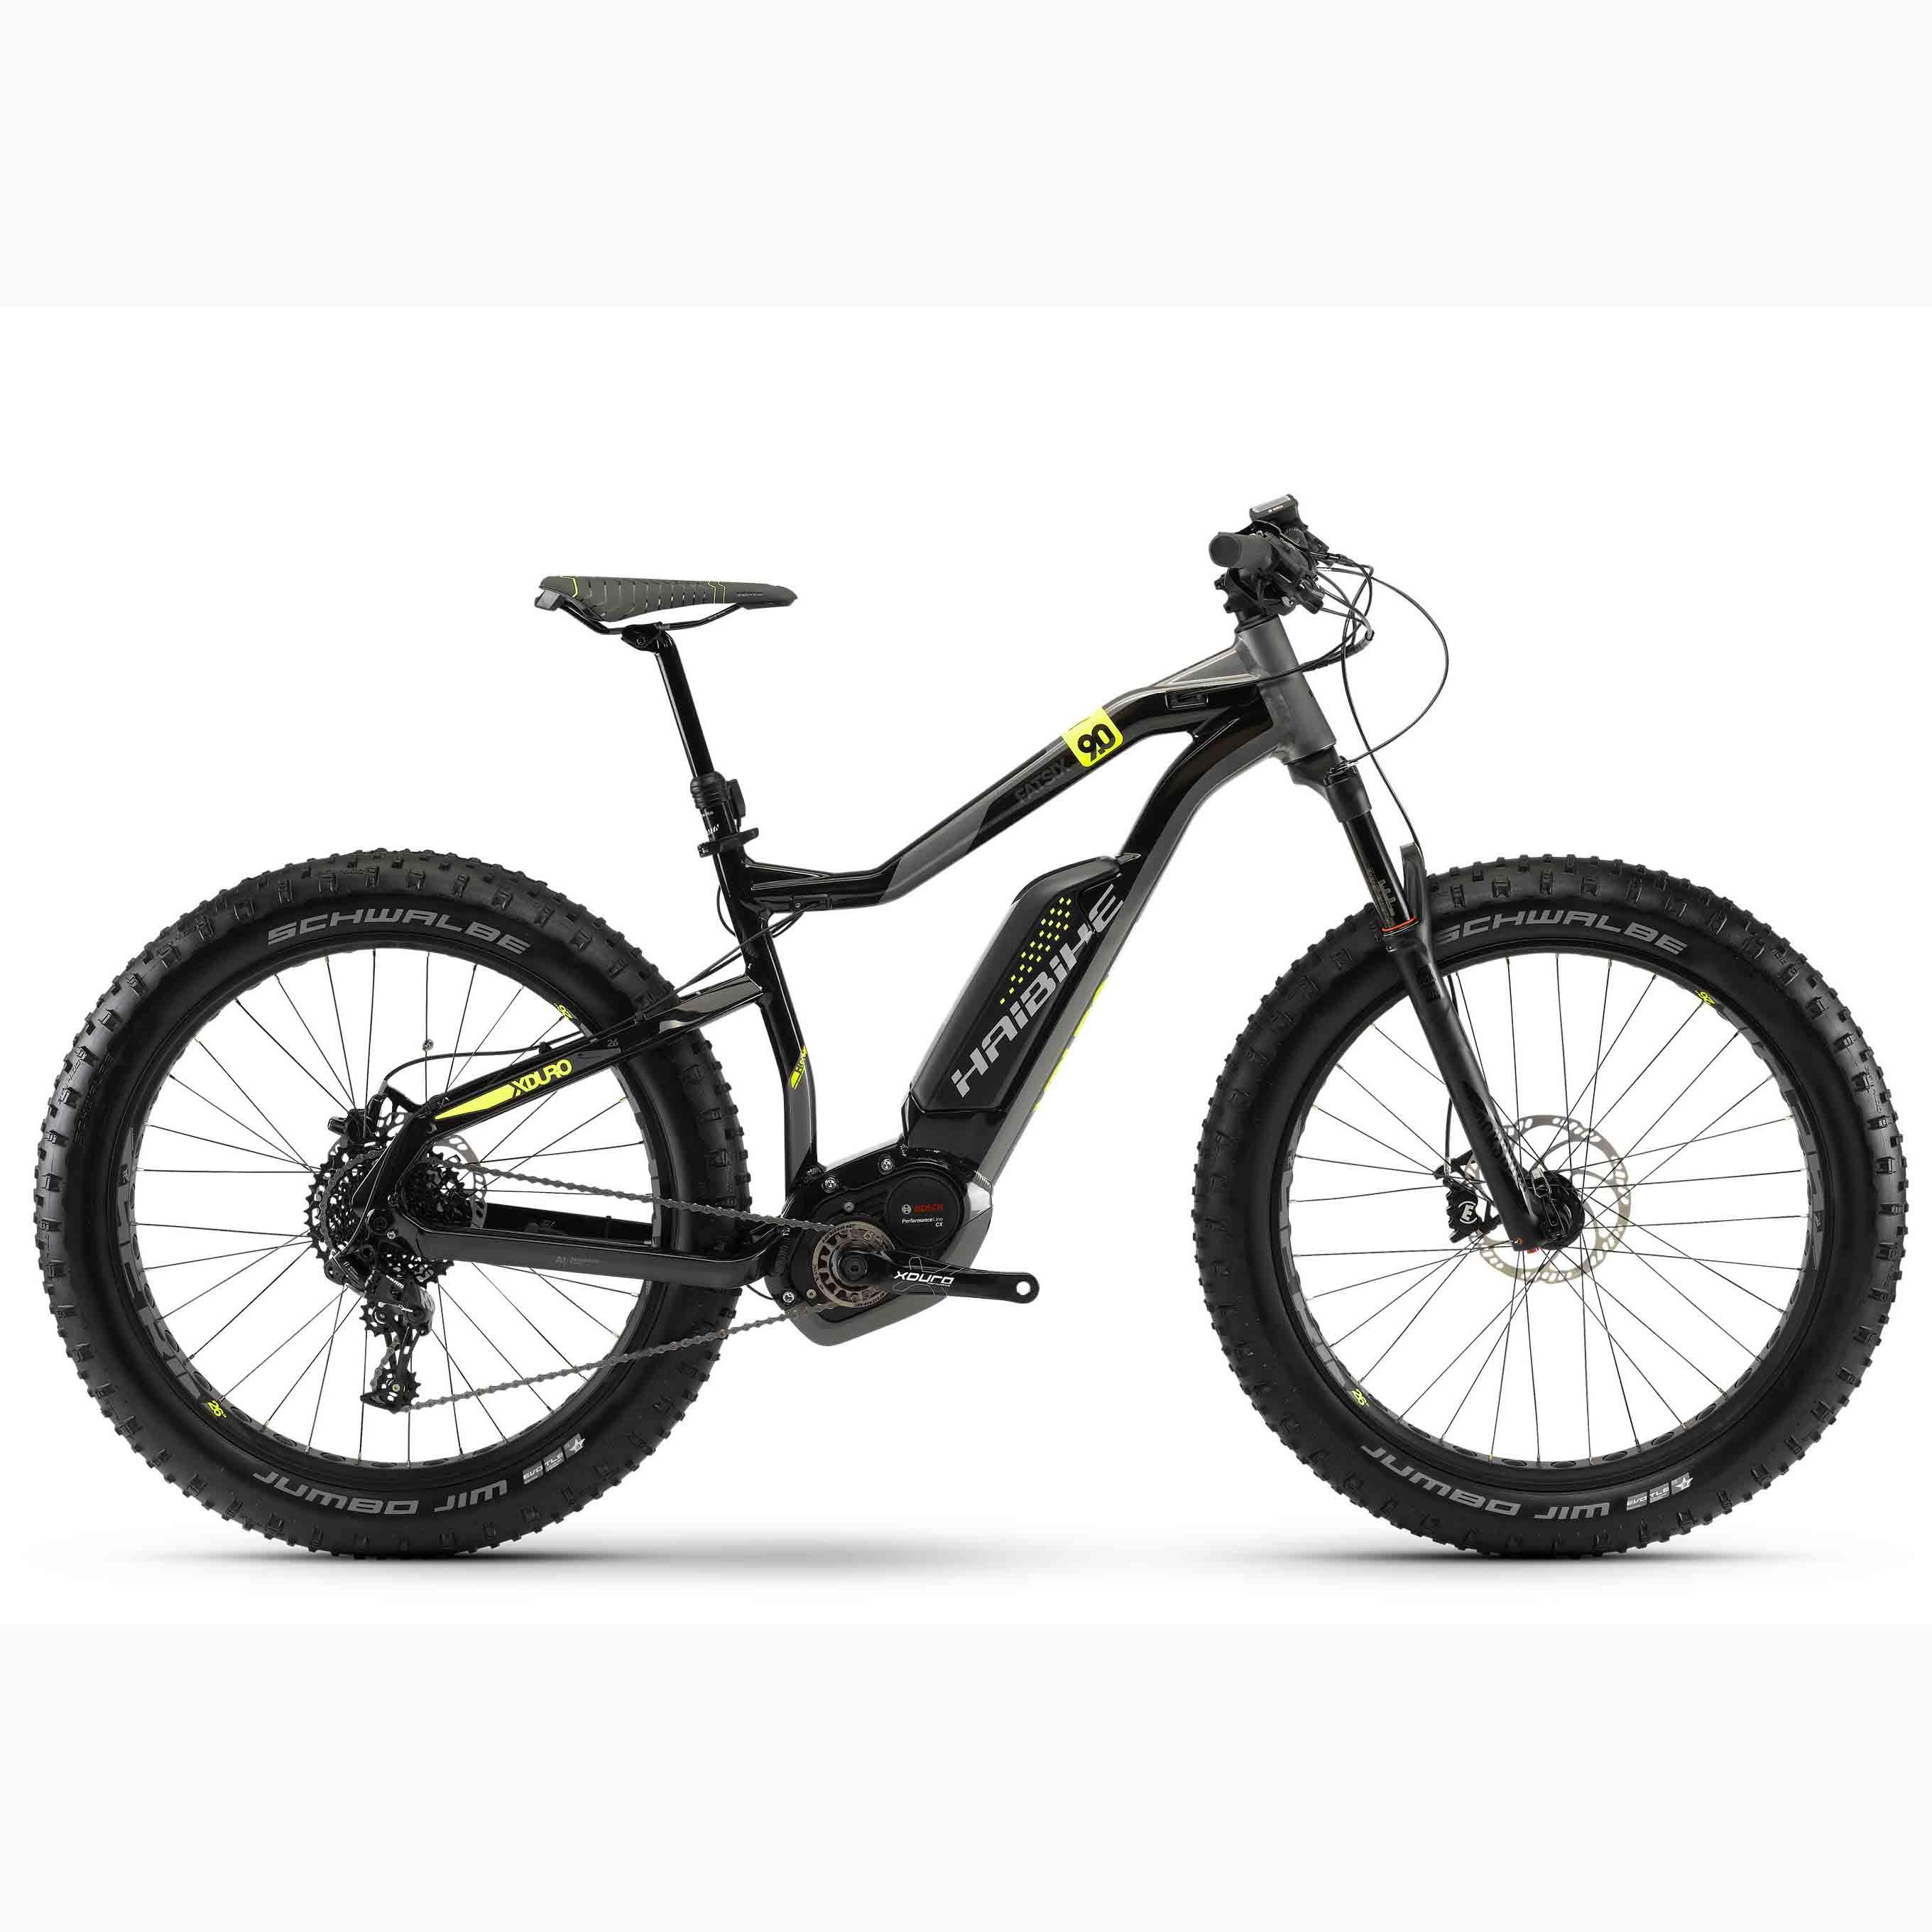 Фото Велосипед Haibike SDURO FullSeven LT 4.0 27,5″ 400Wh, рама 48см, ход:150мм, 2018